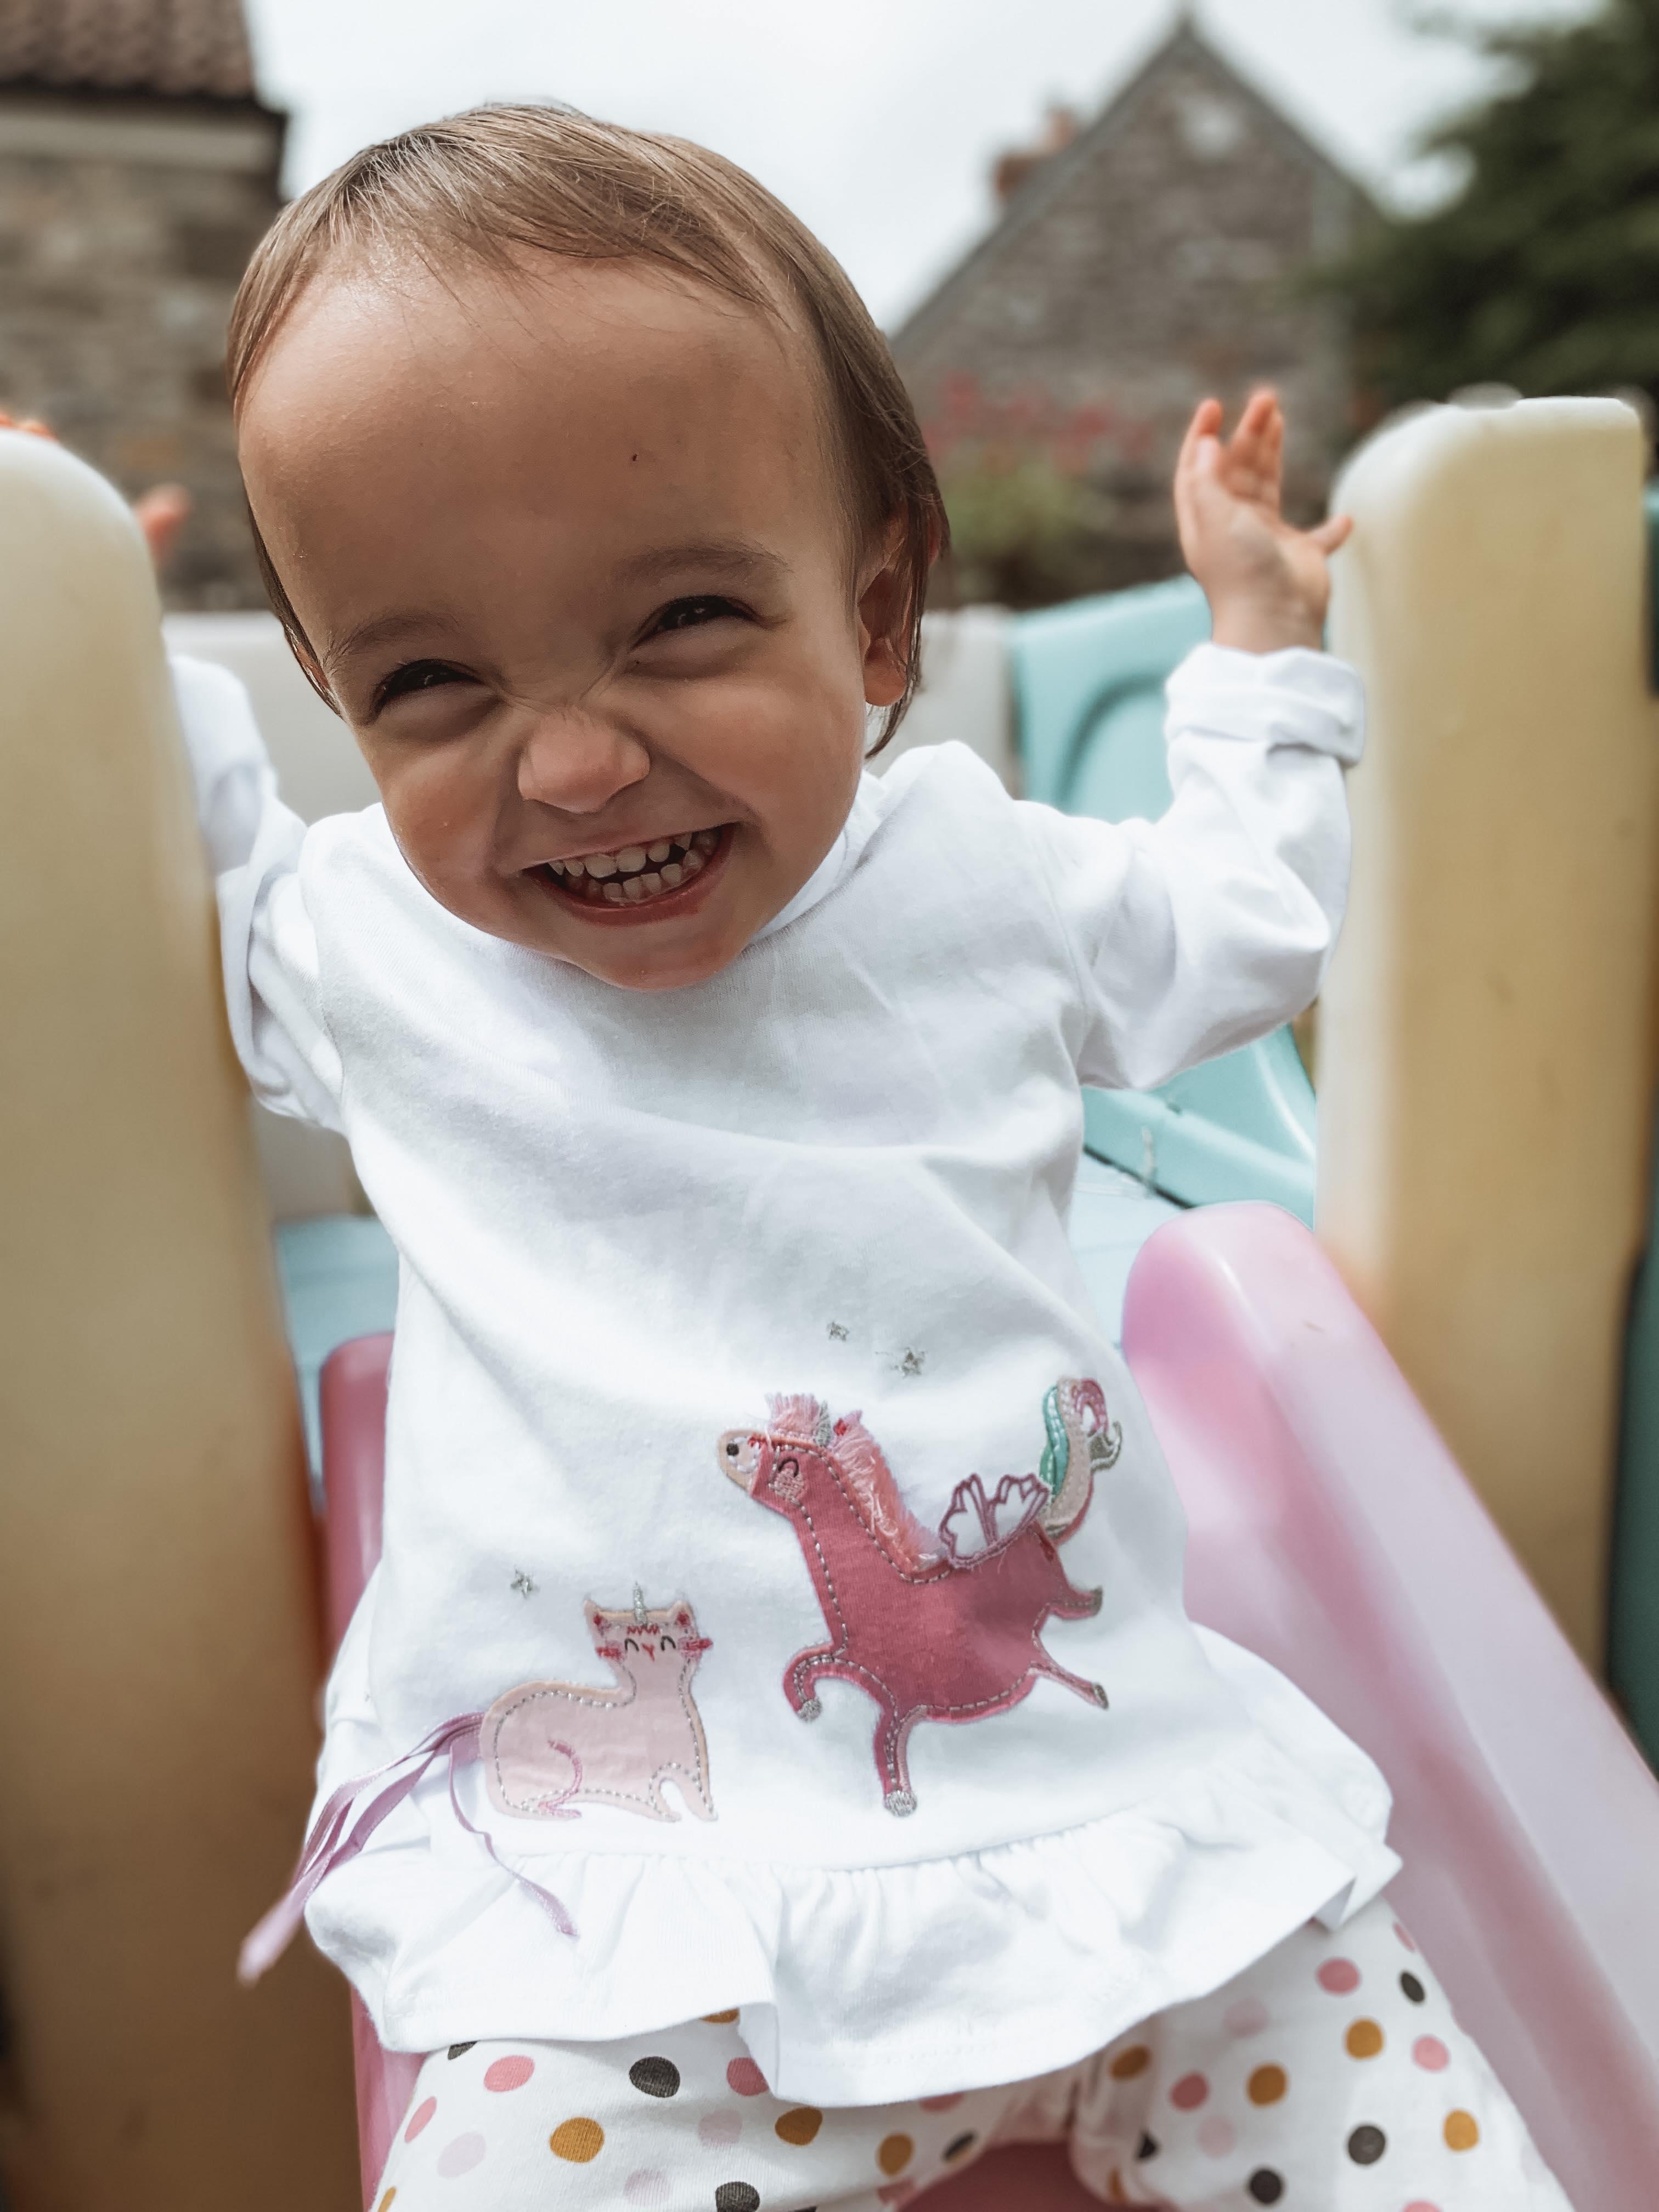 Dottie - that smile!